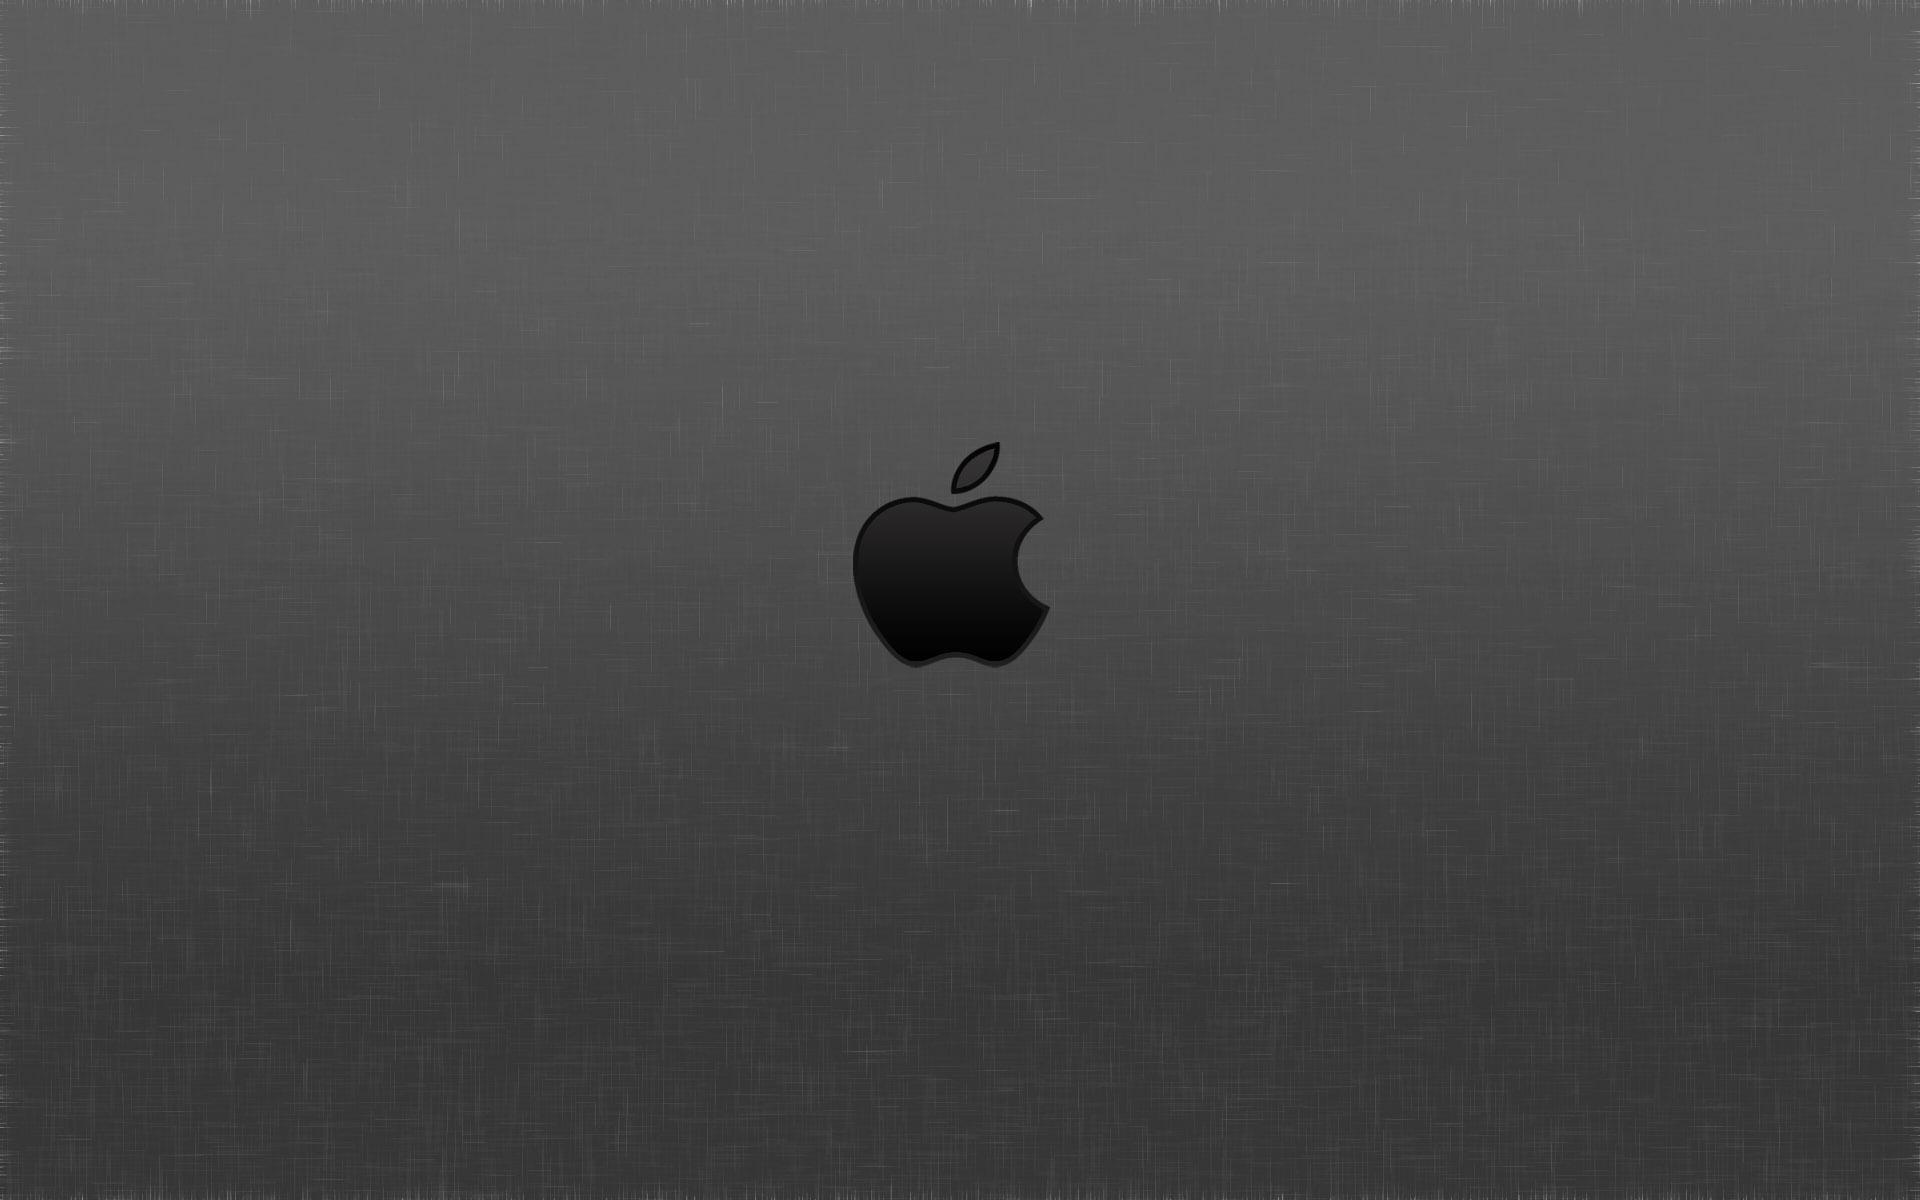 Apple Logo Wallpaper Wallpaper World 1920x1200